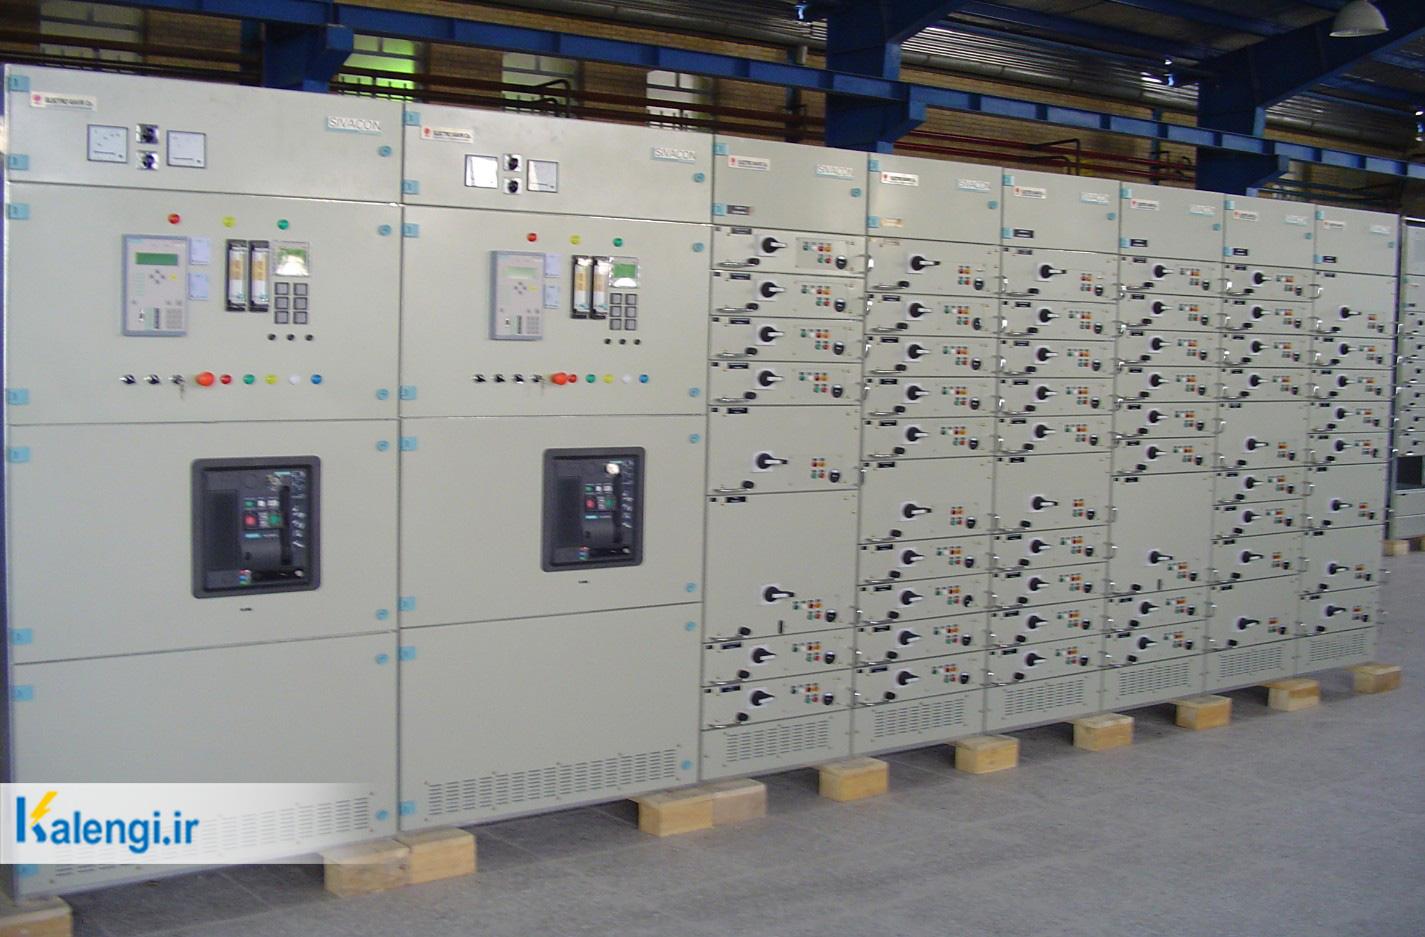 انواع تابلو برق - تابلو اصلی